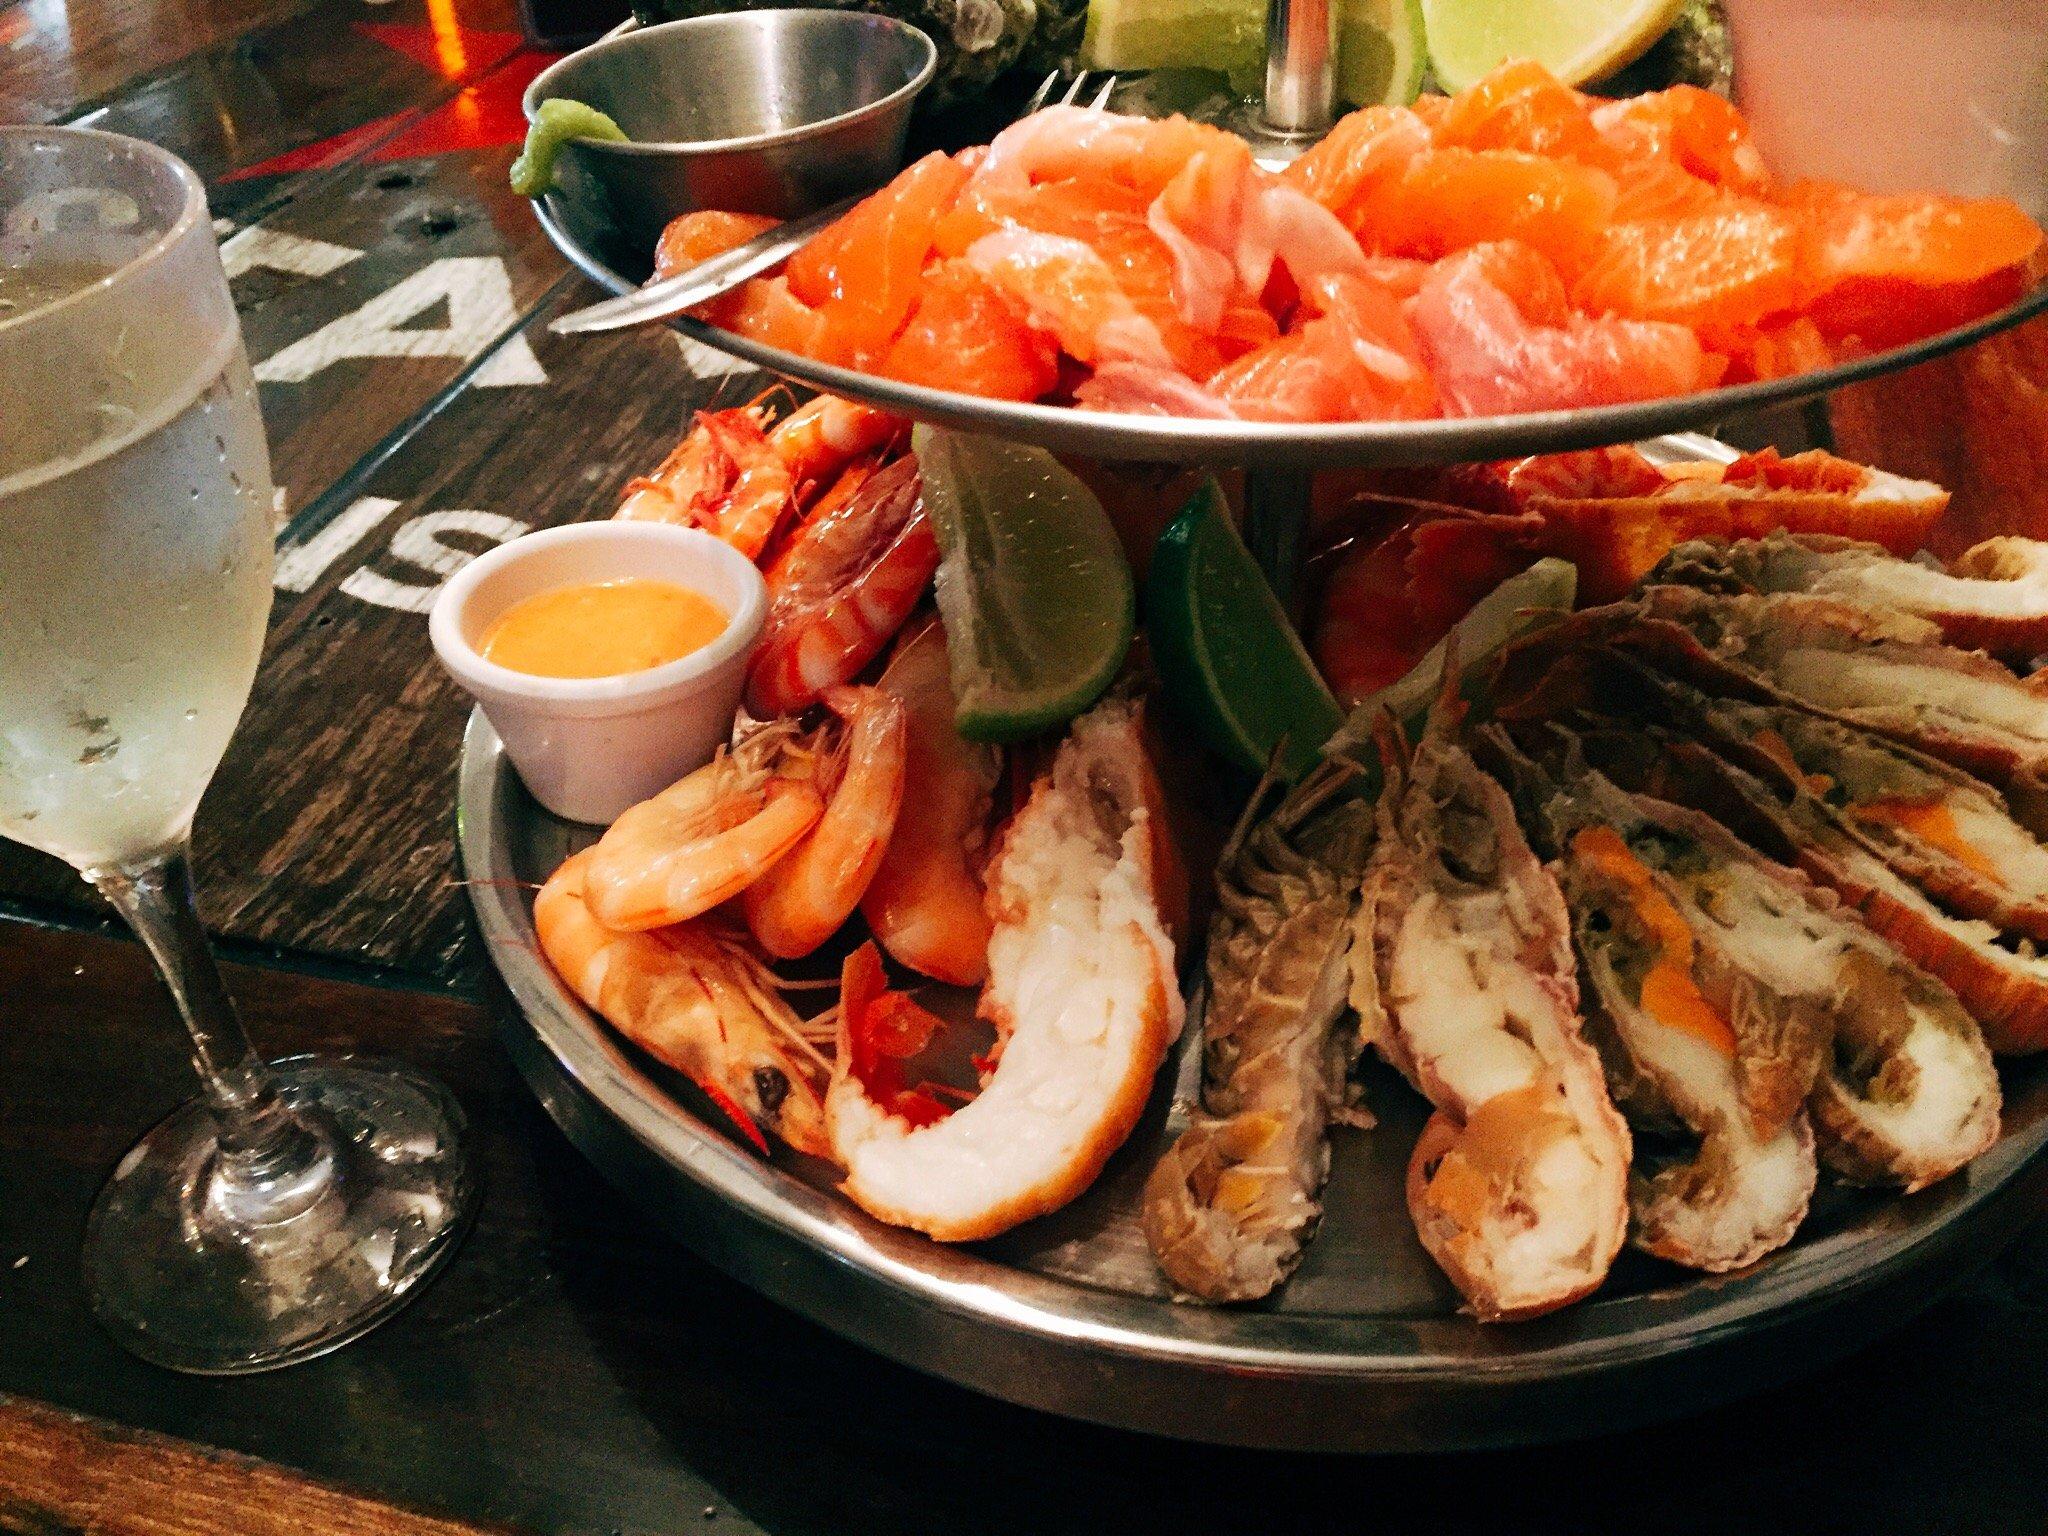 Prawn Star鮮甜多汁的生猛海鮮